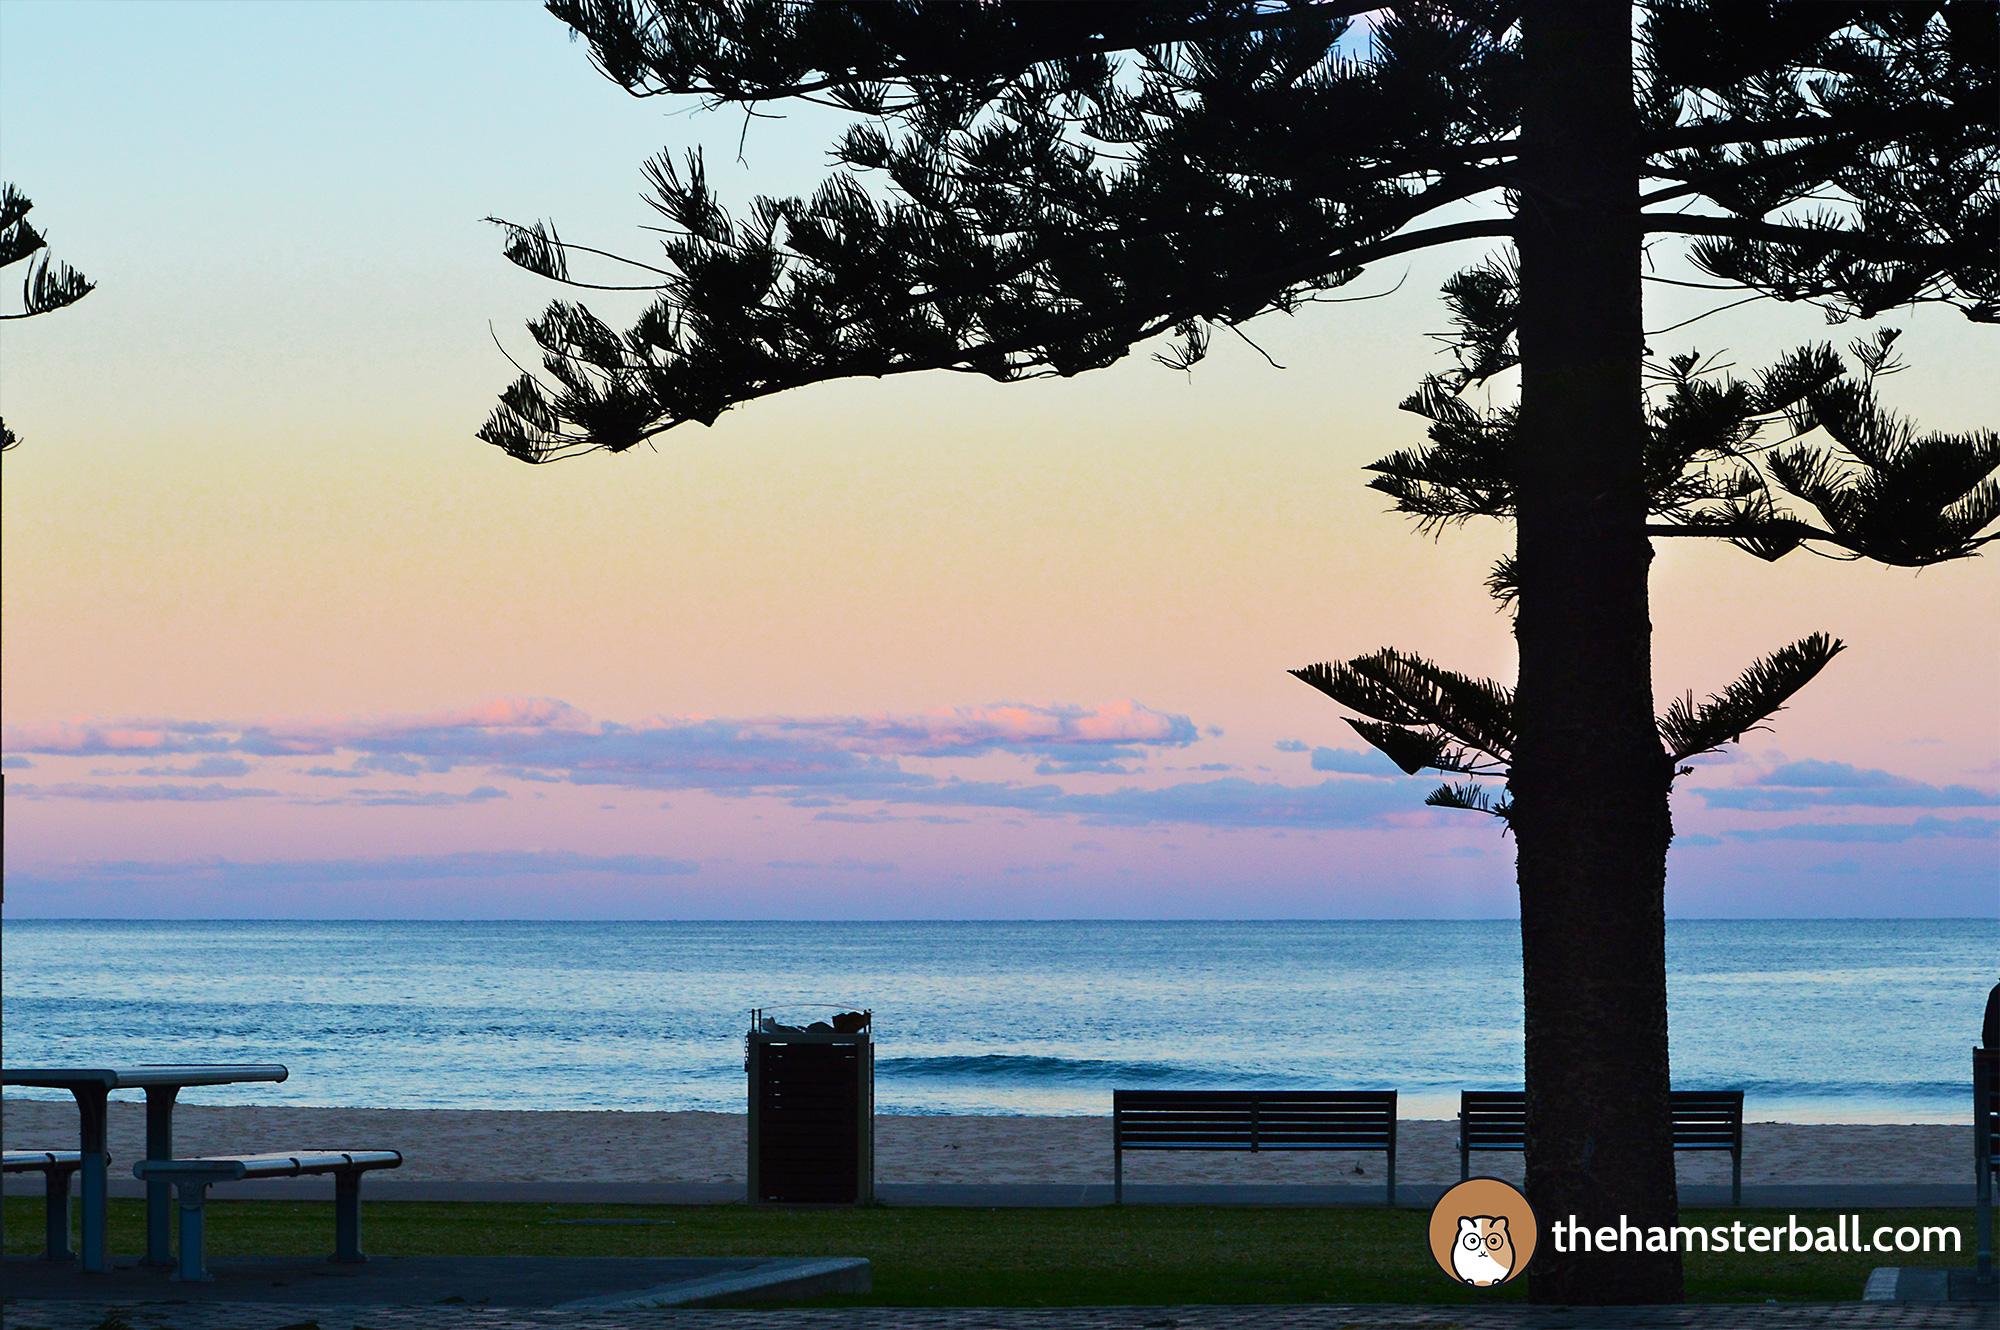 Sunset, Shells Diner, Austinmer Beach, Wollongong, Australia